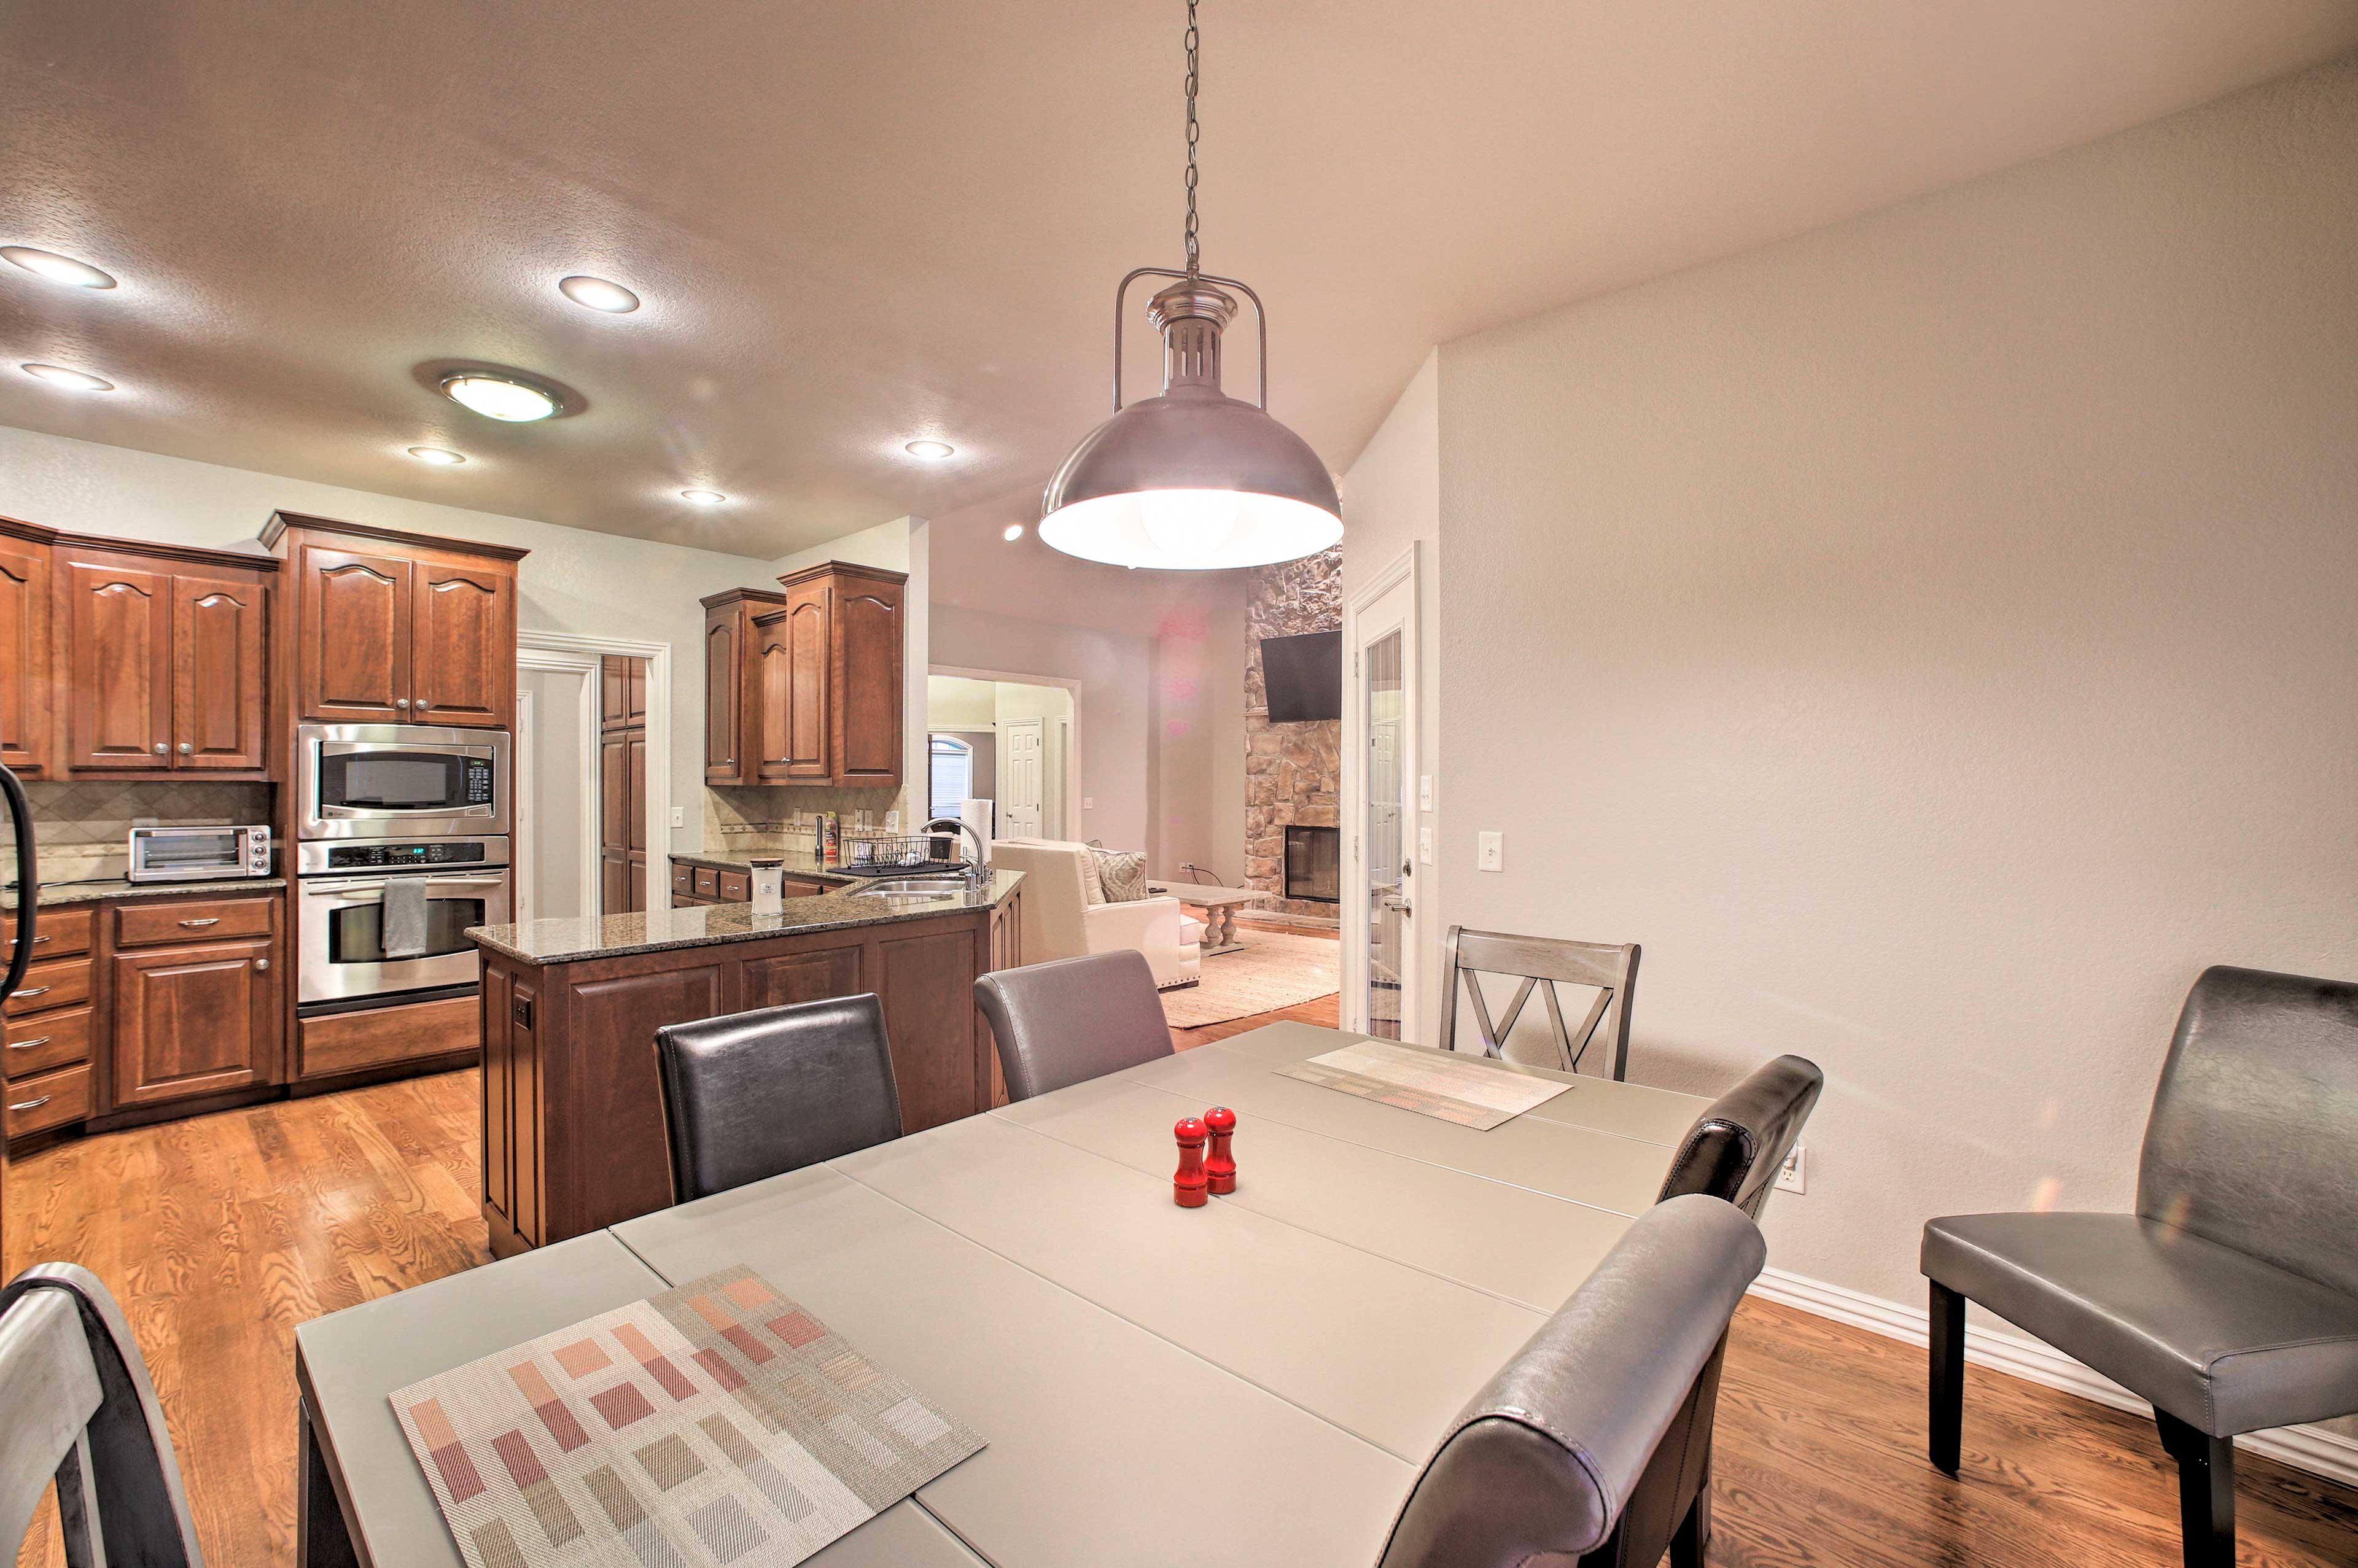 Kitchen   Granite Countertops   Dining Area